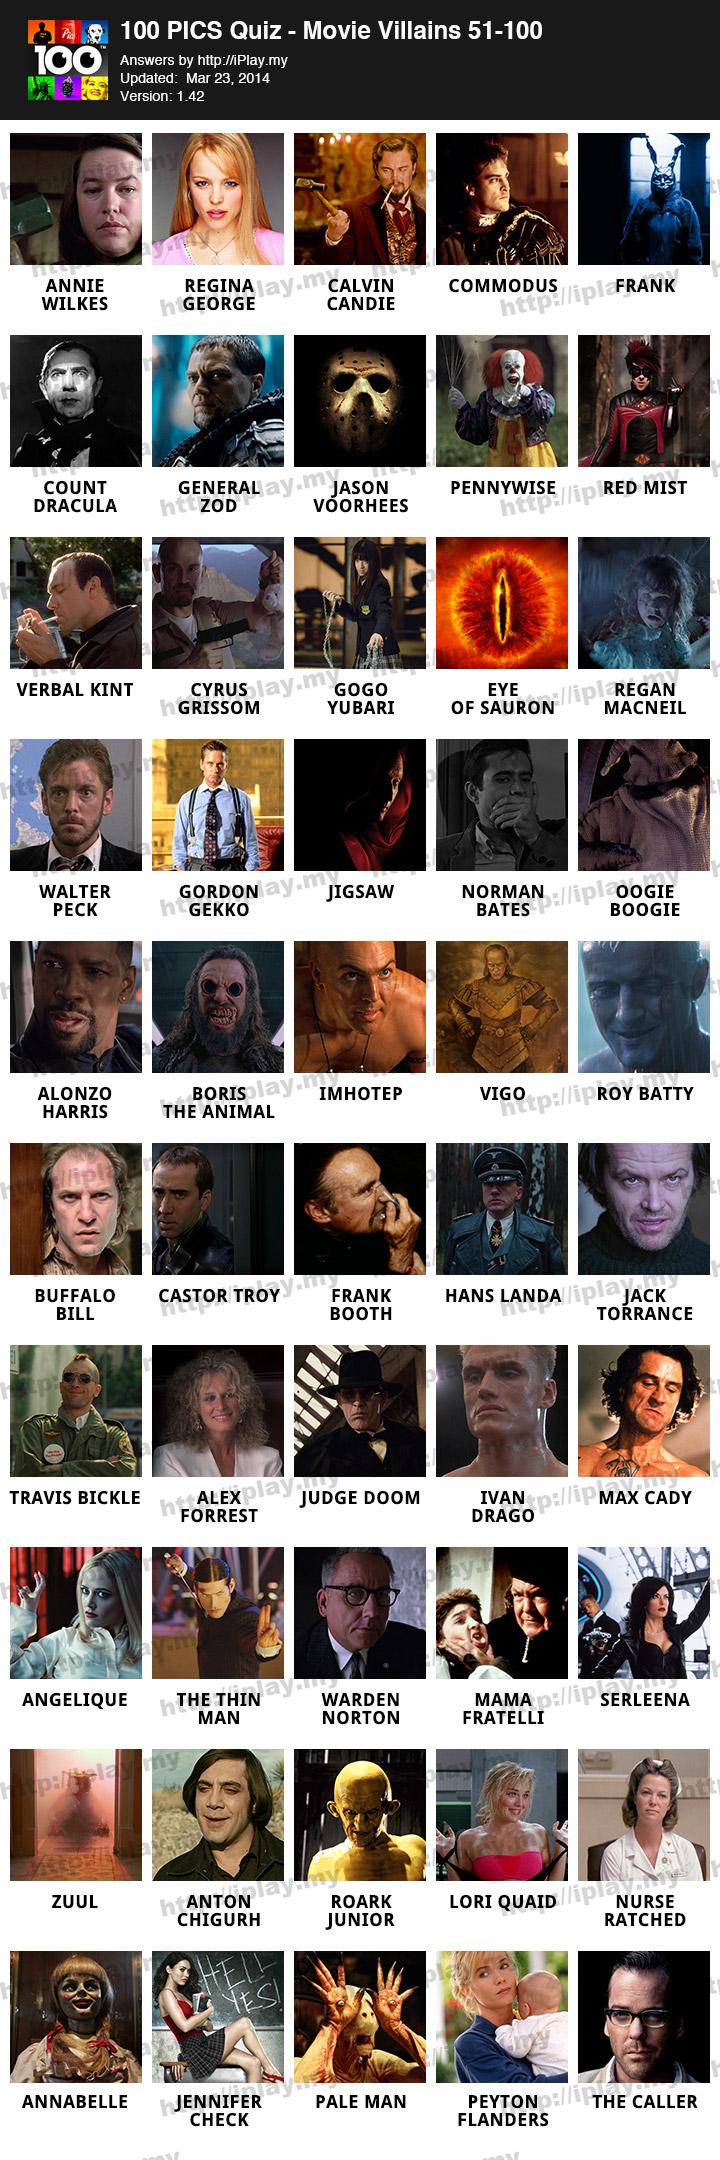 100 Pics Answers Movie Stars : answers, movie, stars, Movie, Villains, Answers, IPlay.my